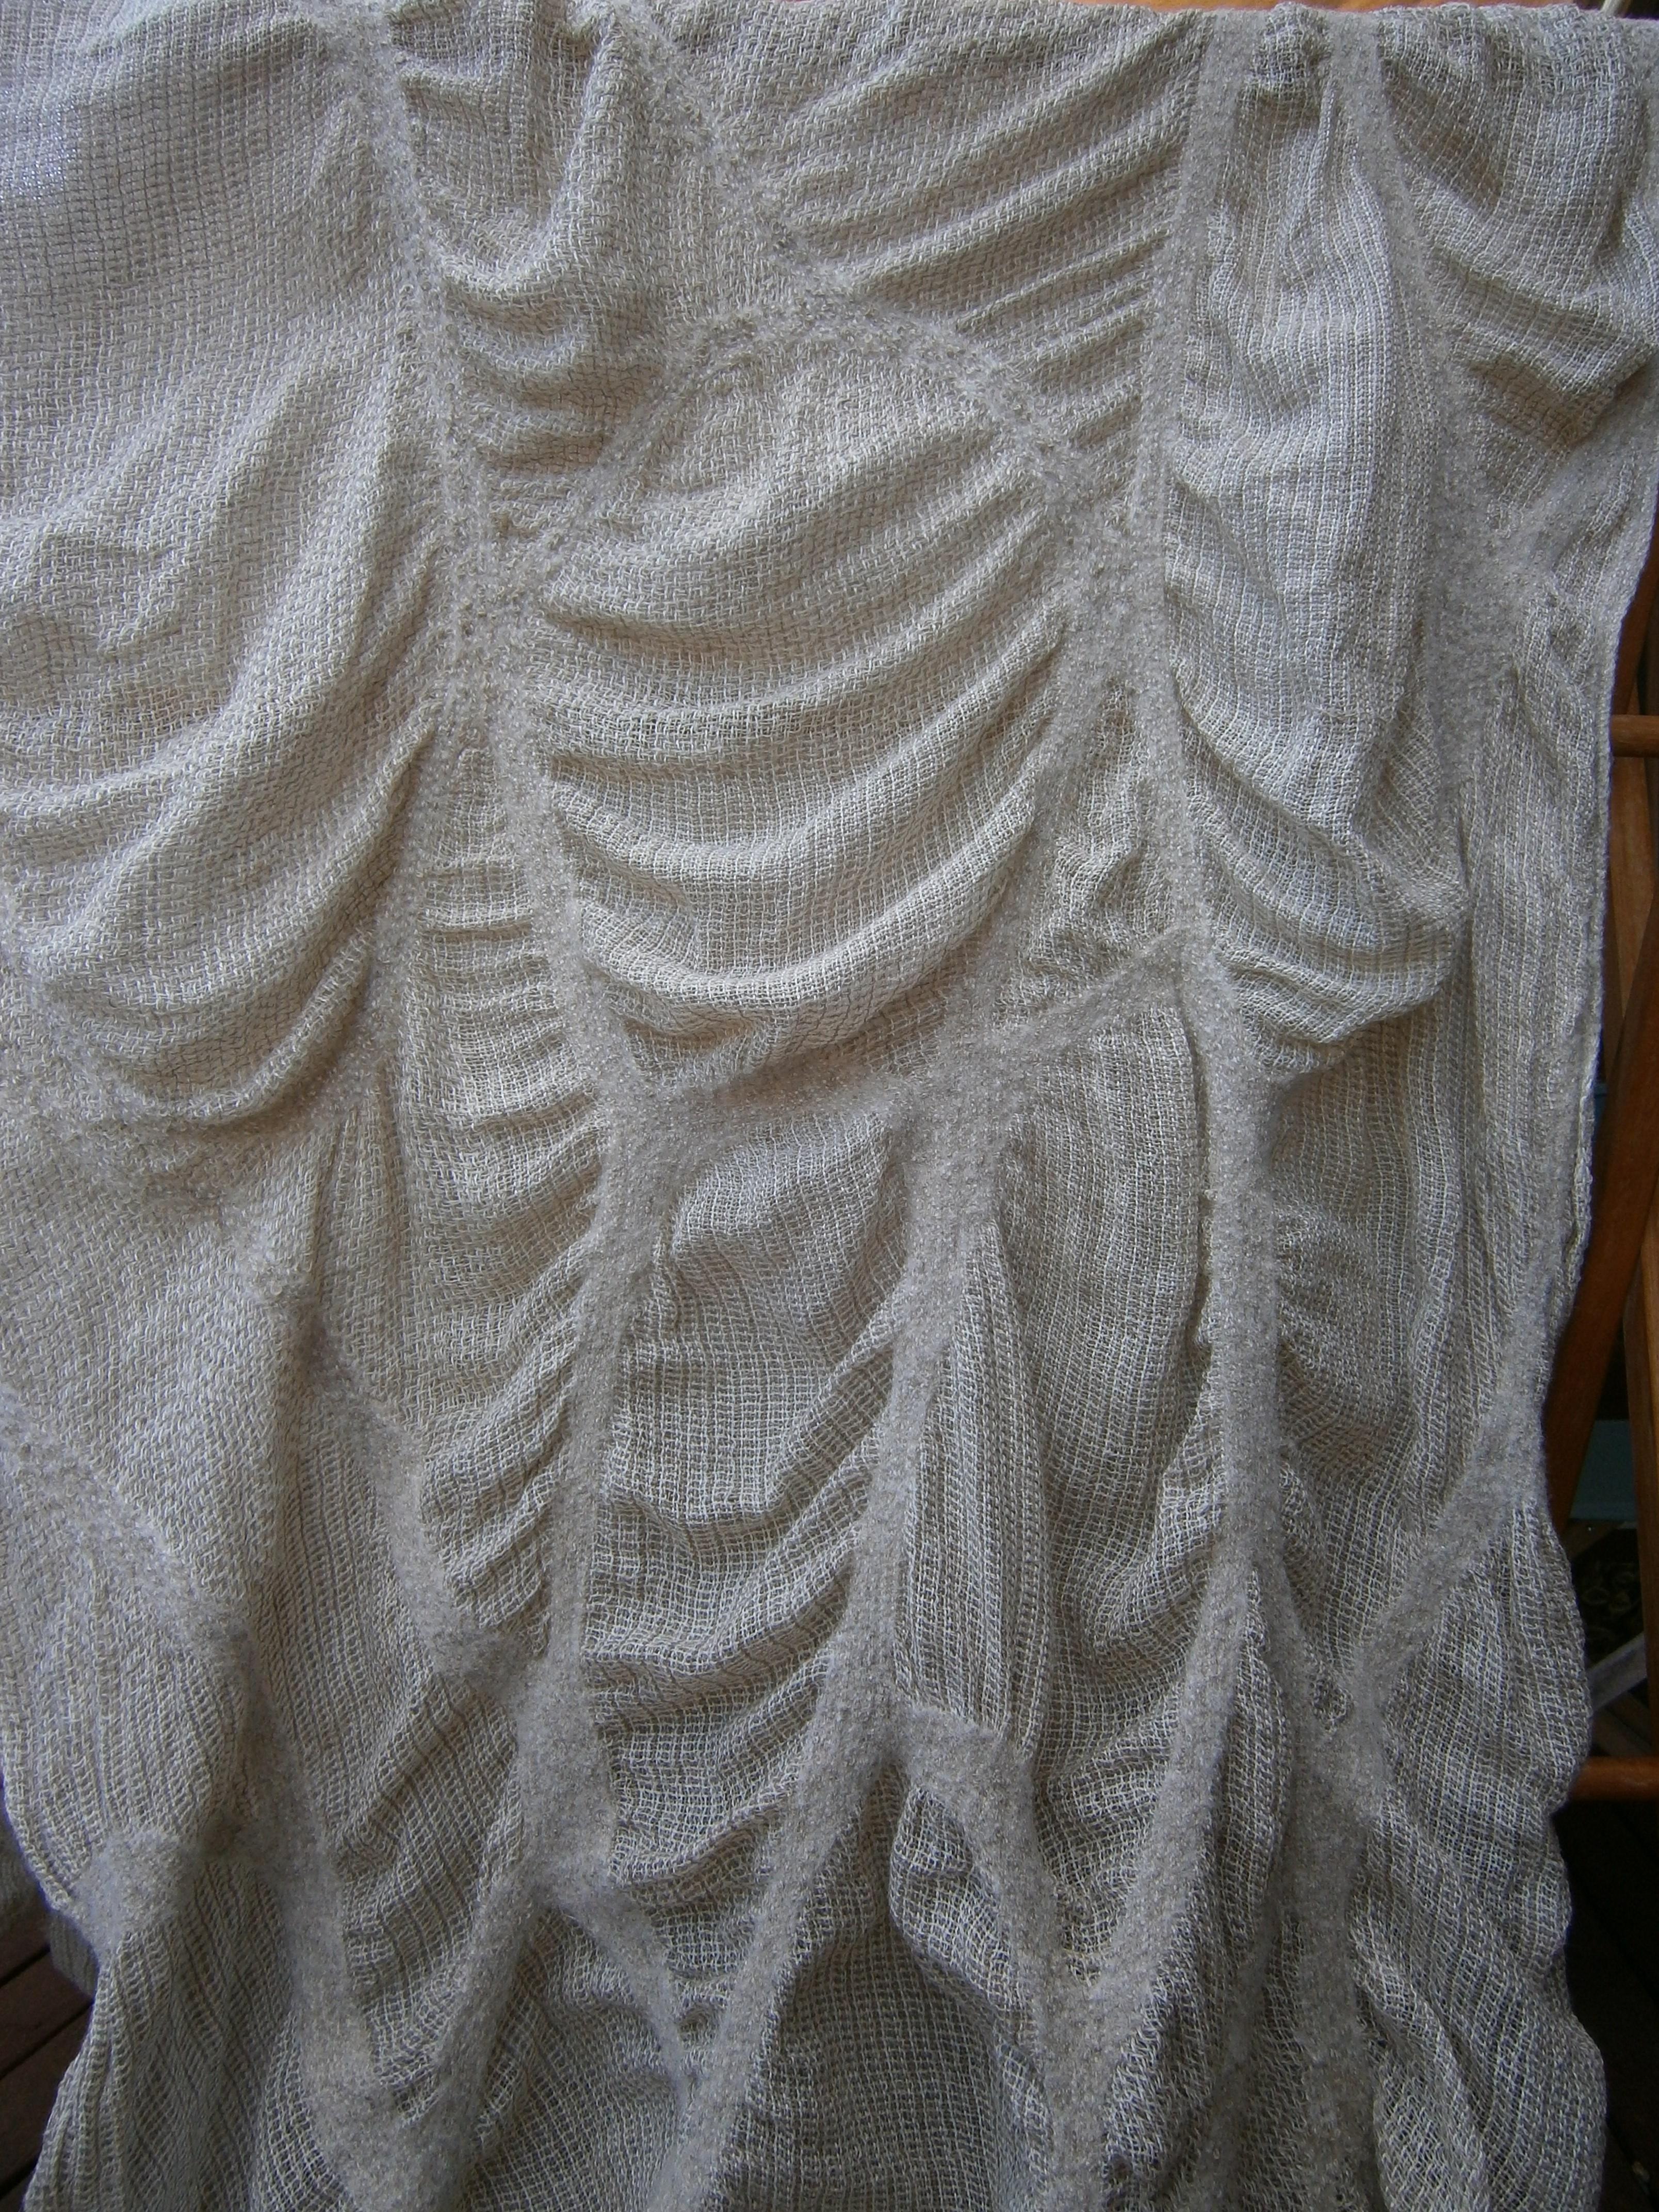 Ra-Cloak Fabric